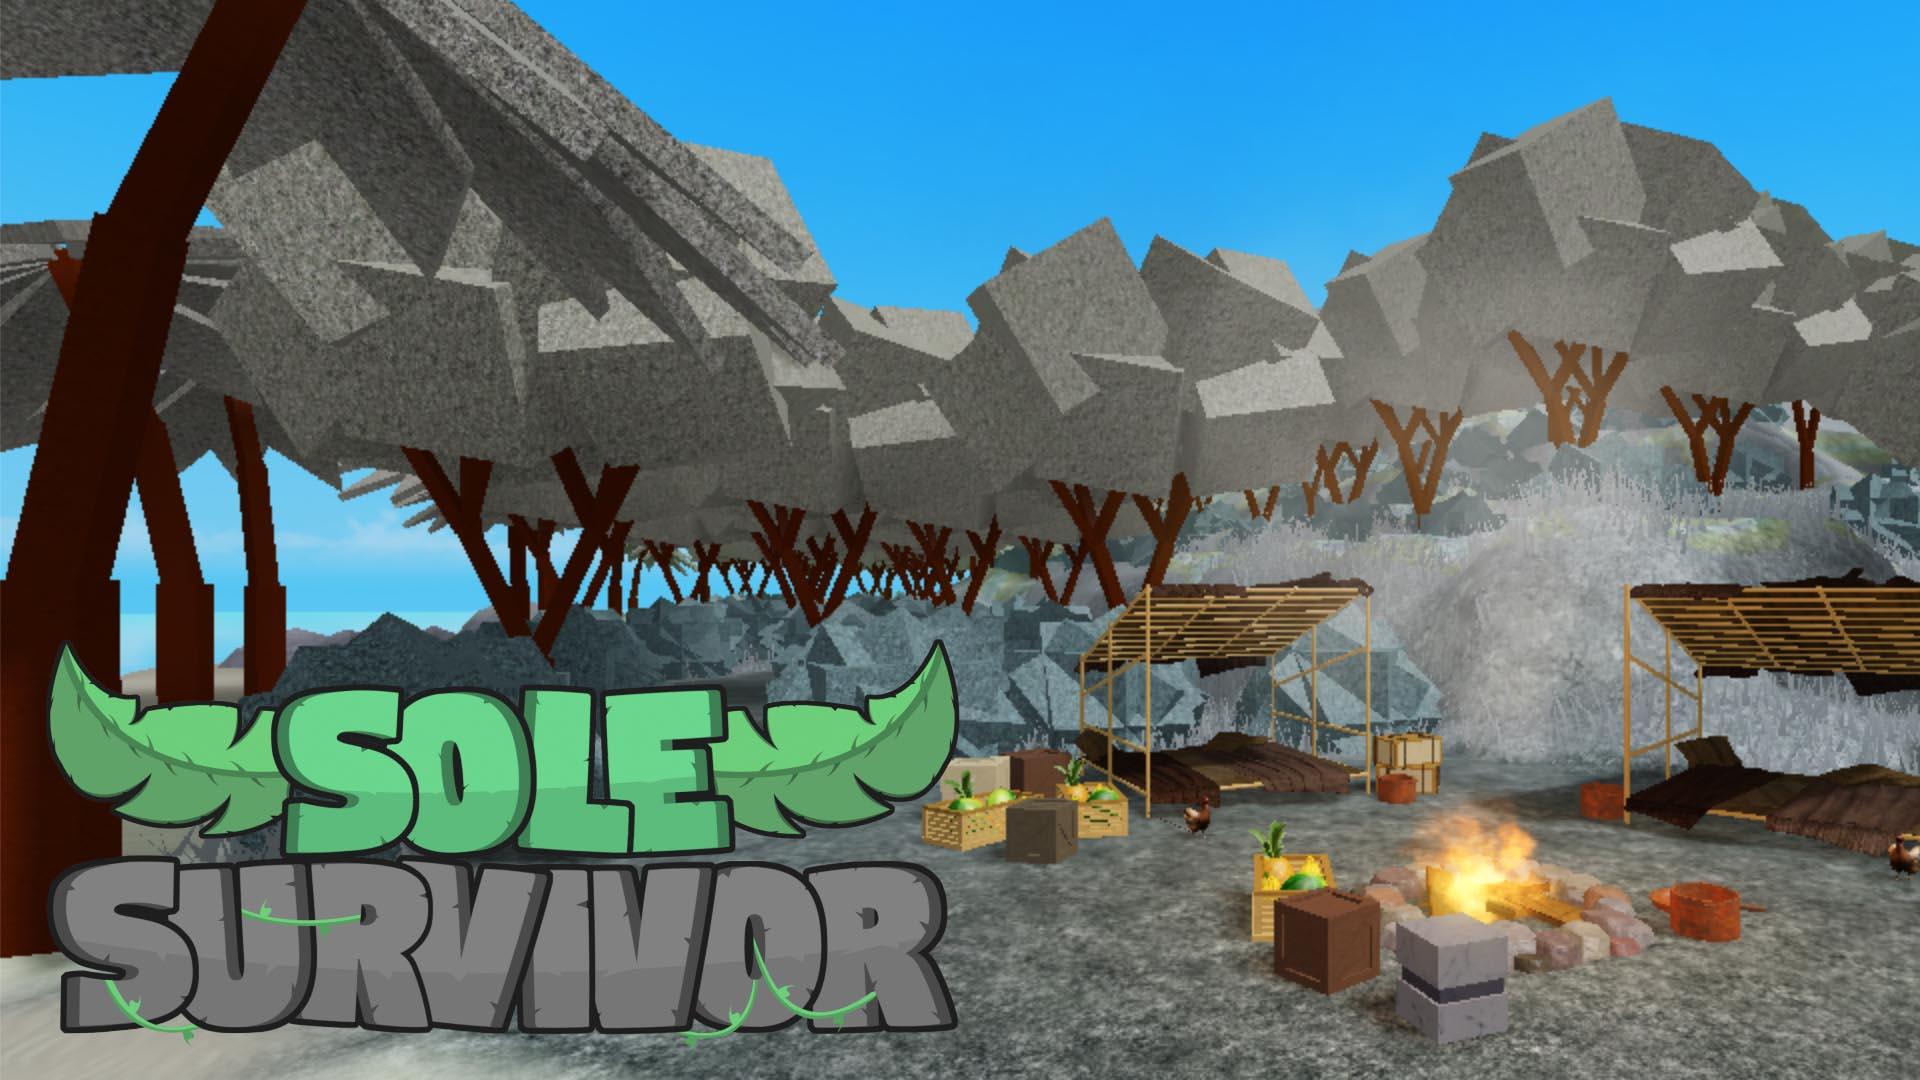 Christmas arrives on Sole Survivor